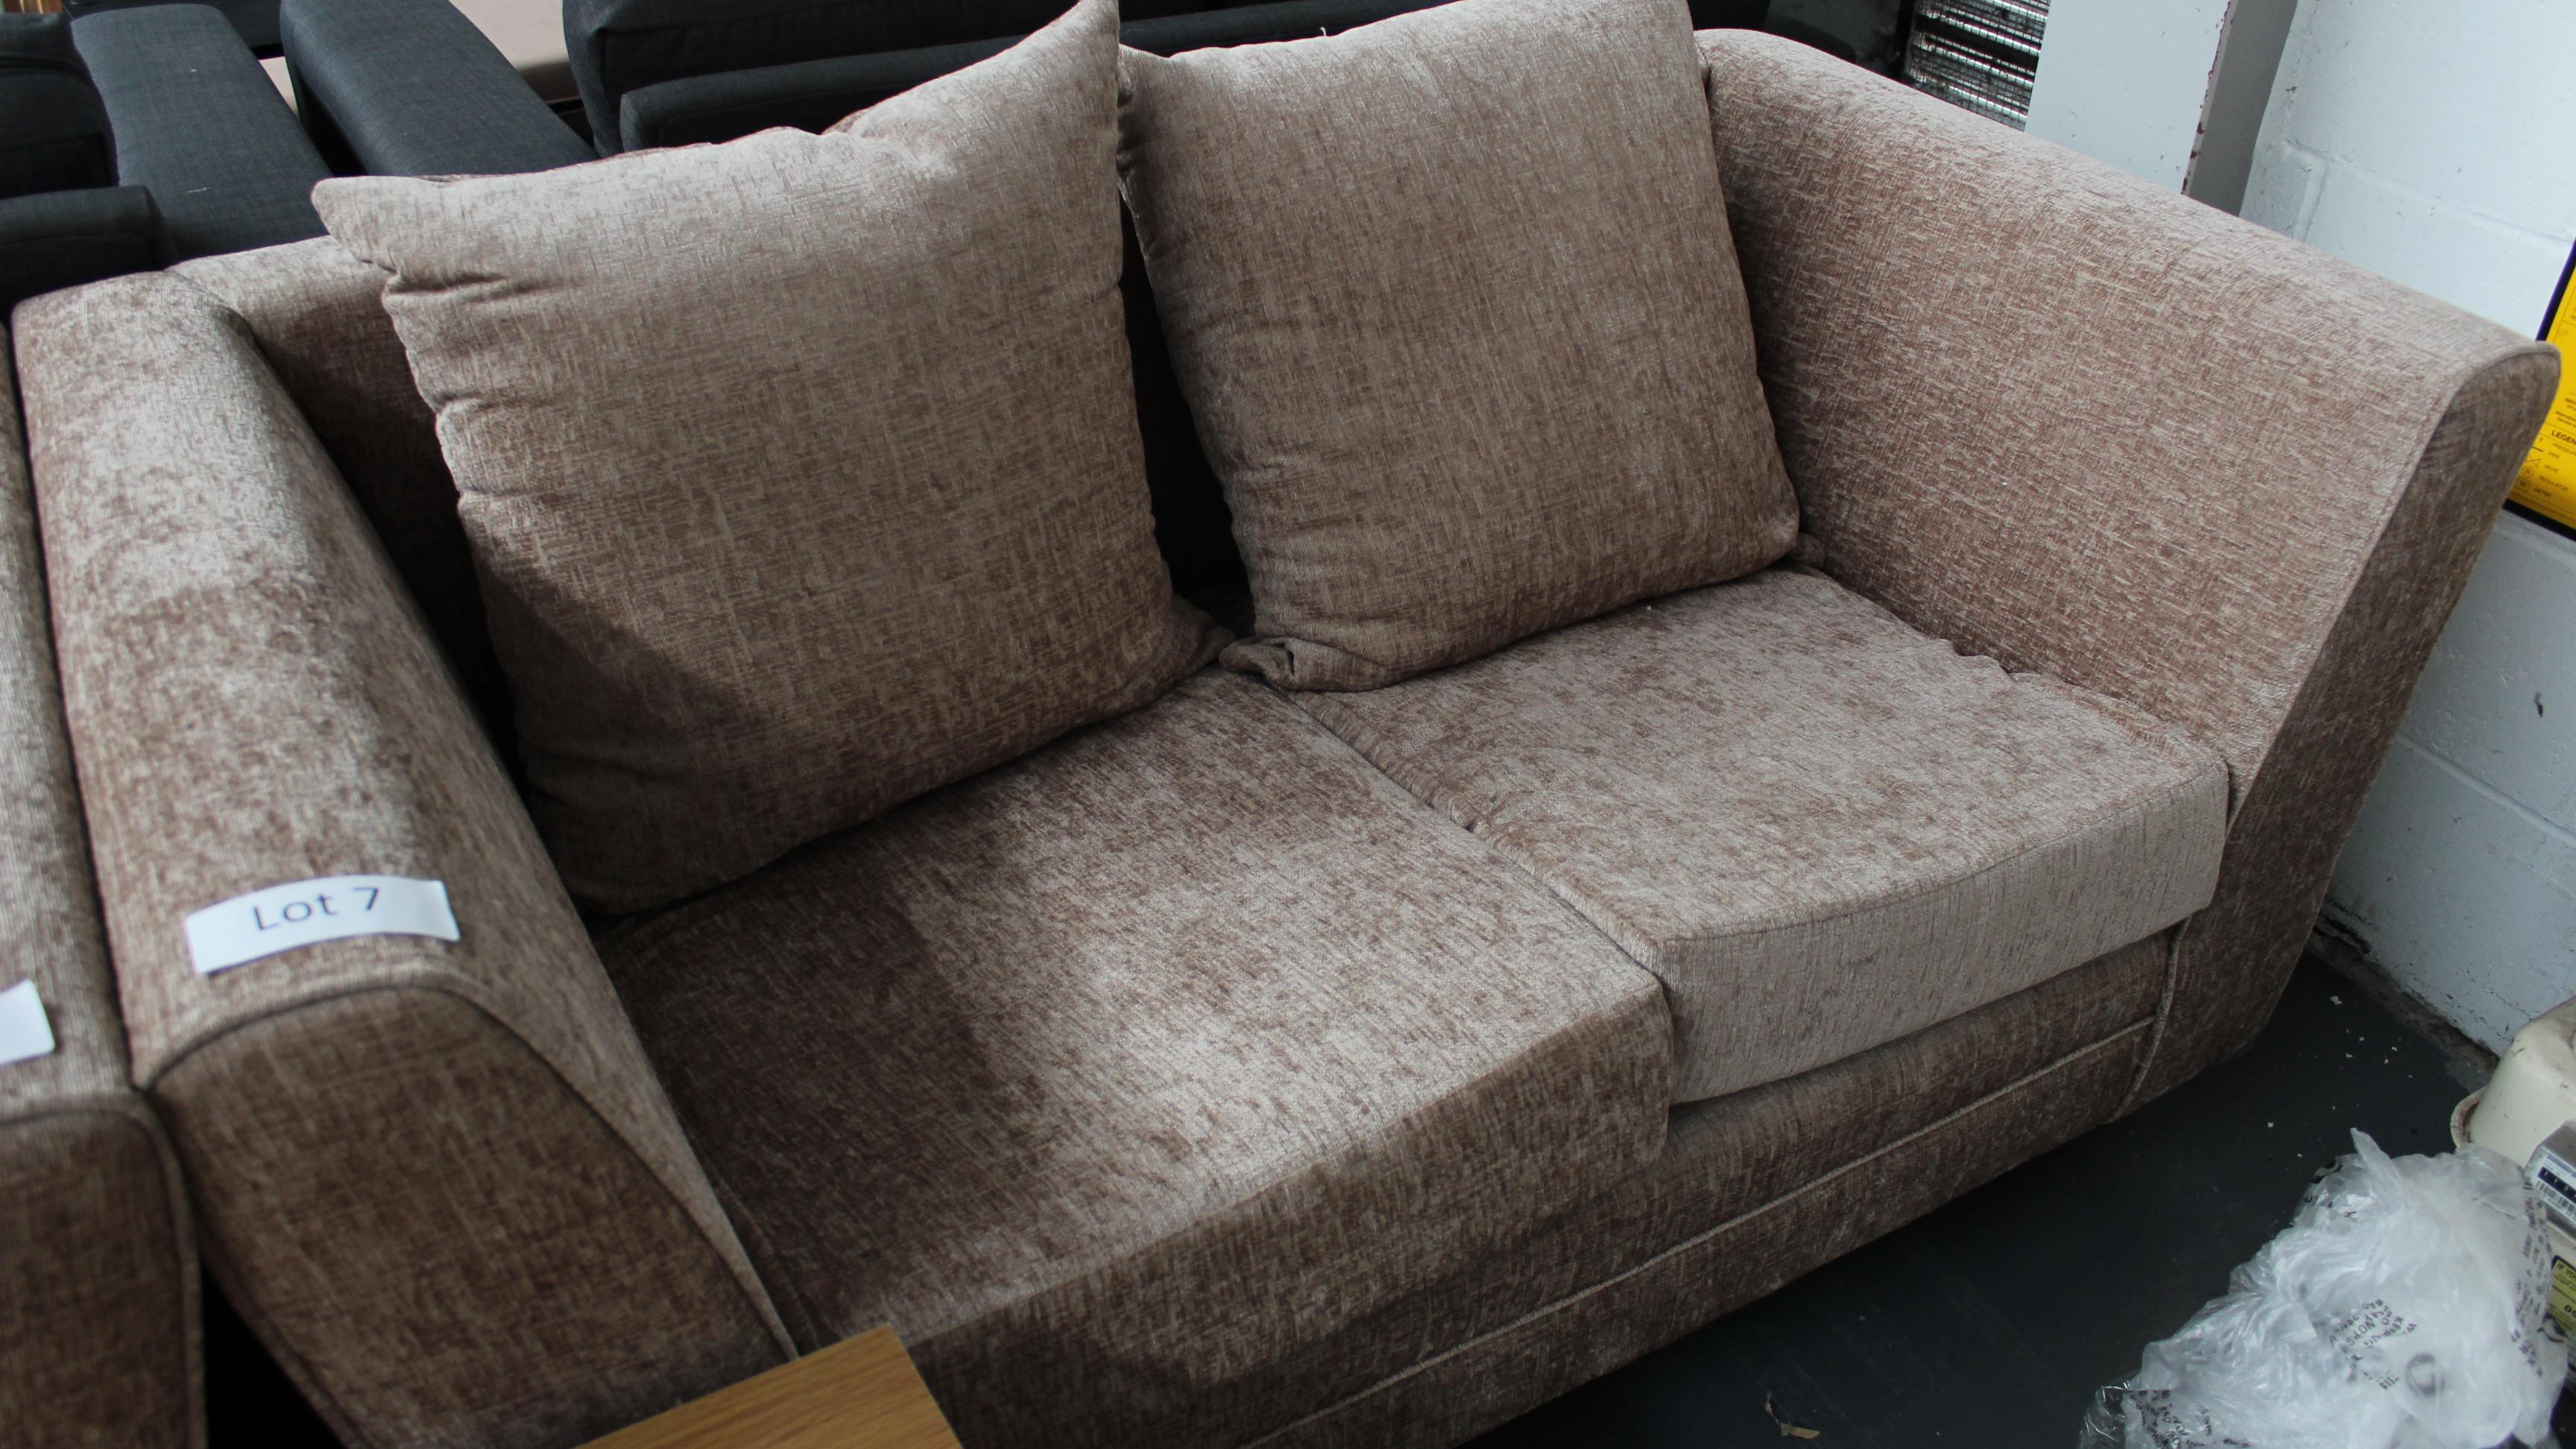 Lot 7 - 2 Seater Mink sofa Customer Returns